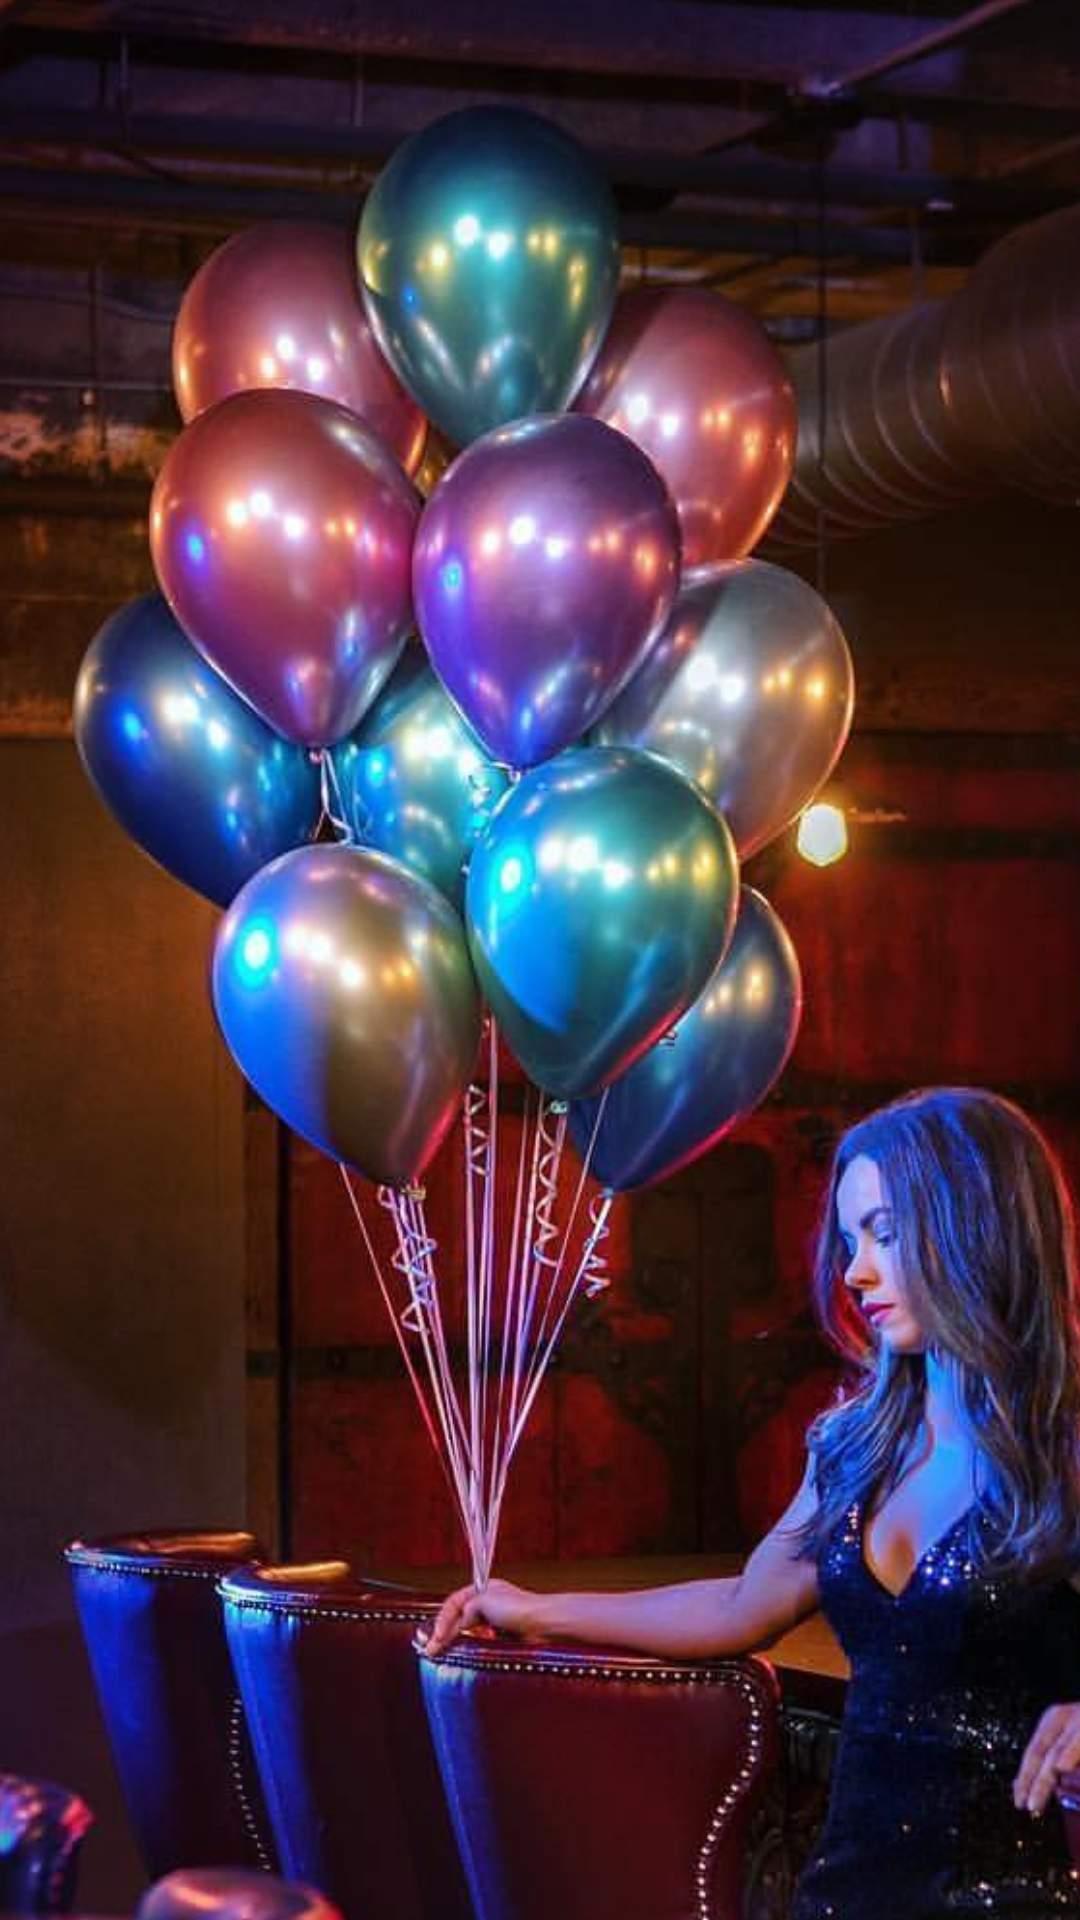 11″ Chrome Πράσινο λάτεξ μπαλόνι